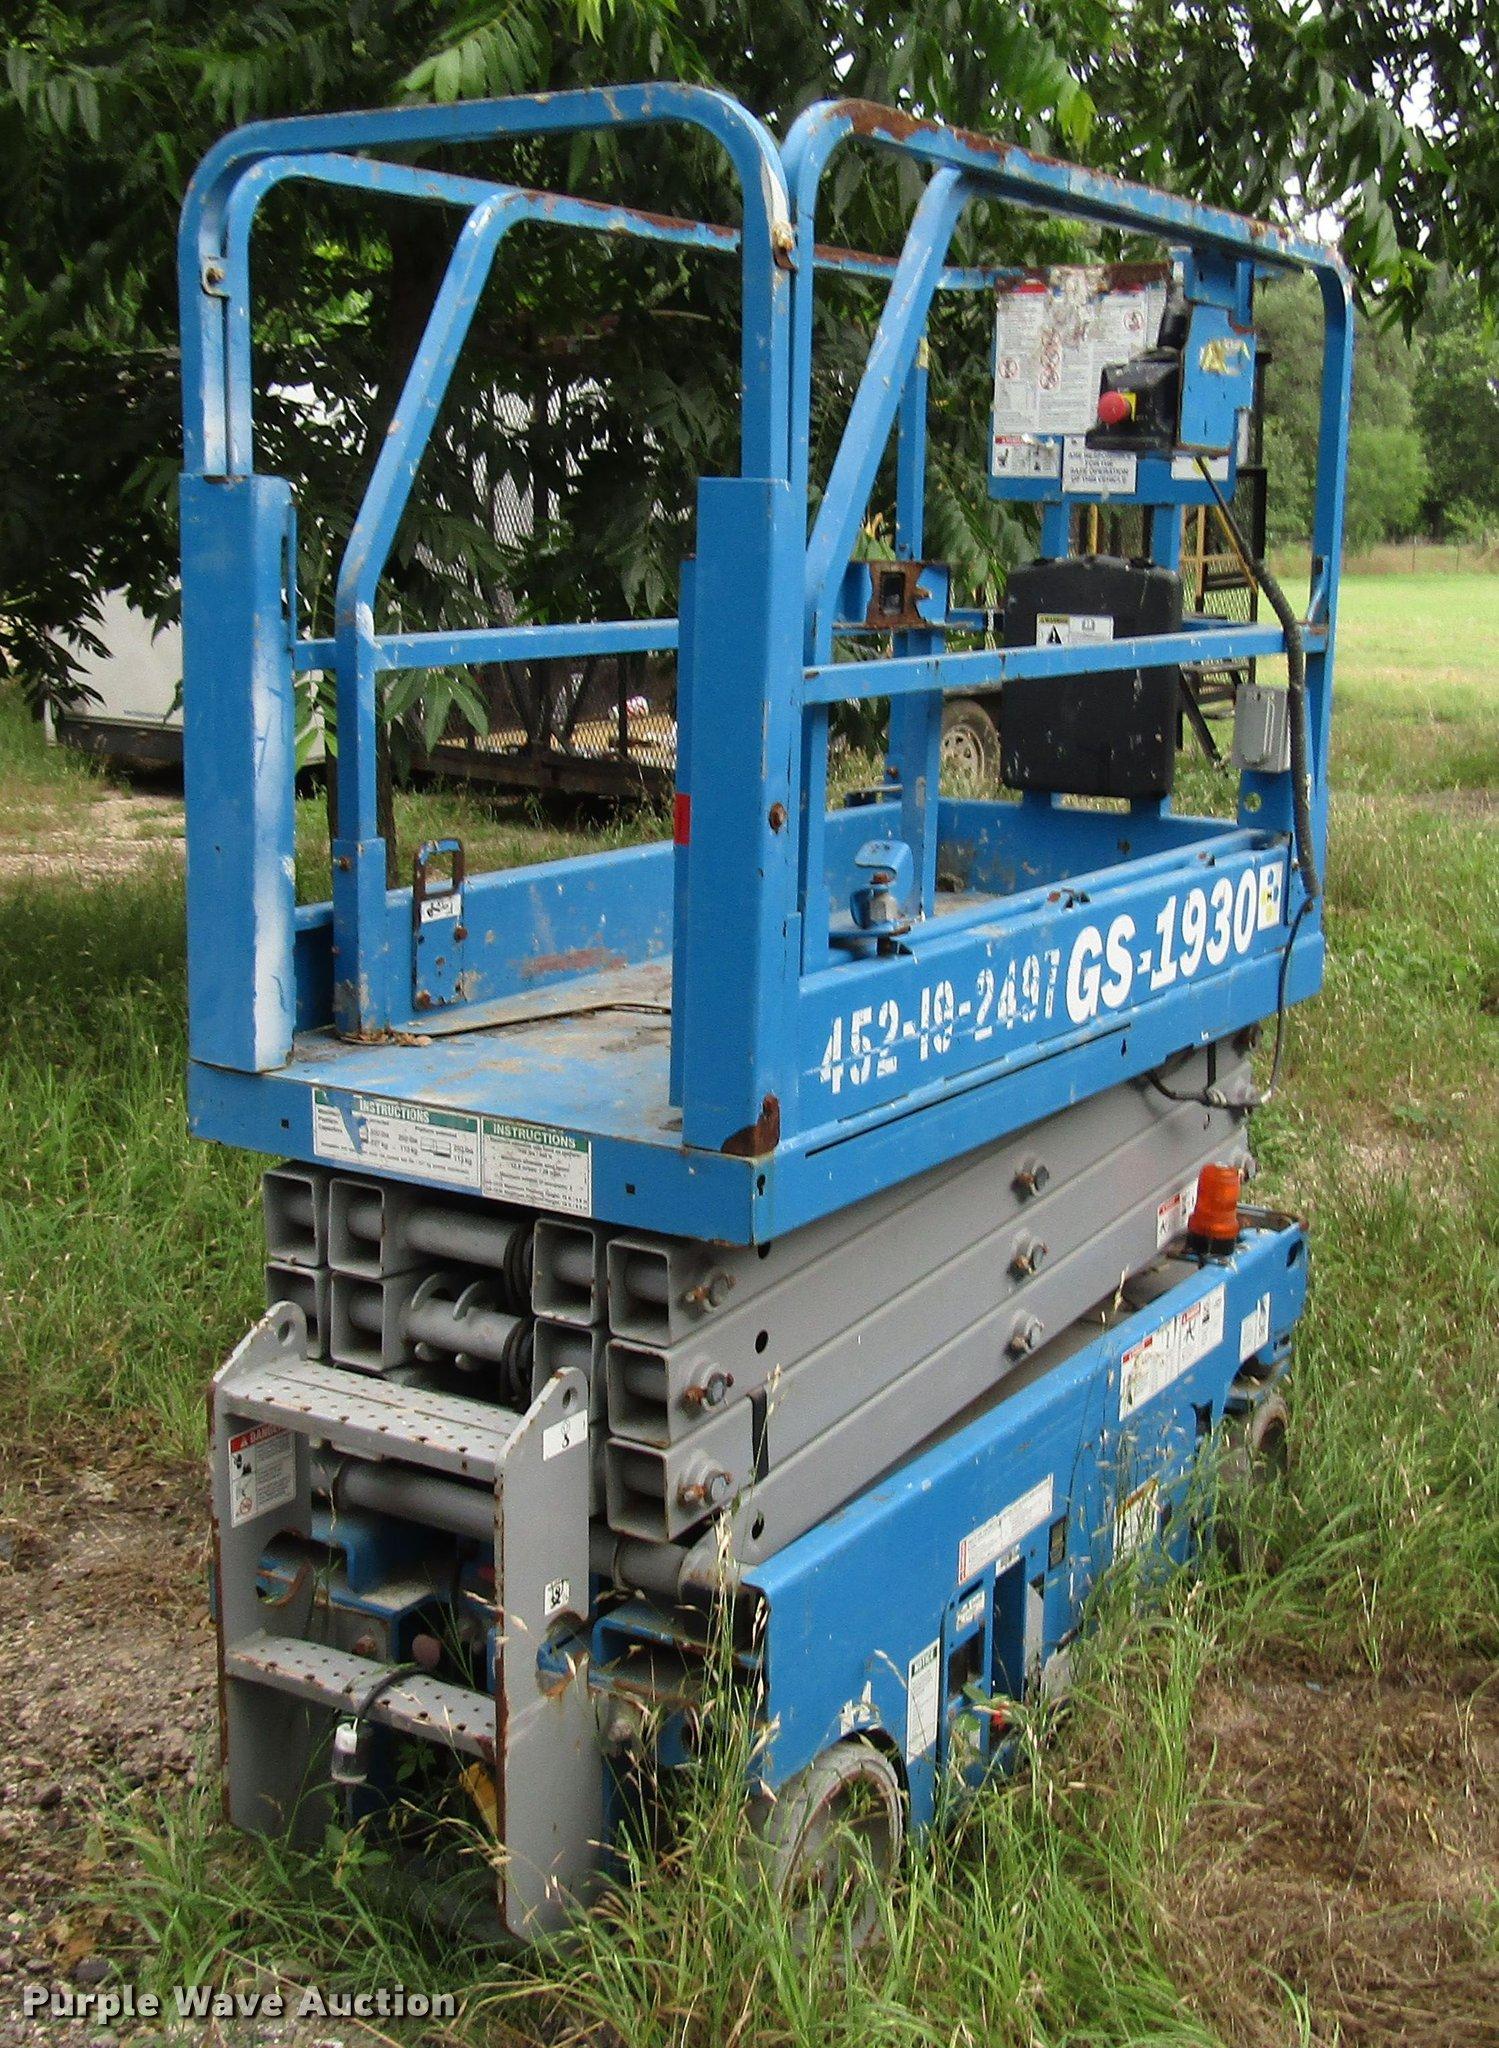 Genie GS-1930 scissor lift | Item DG1184 | SOLD! July 10 Veh